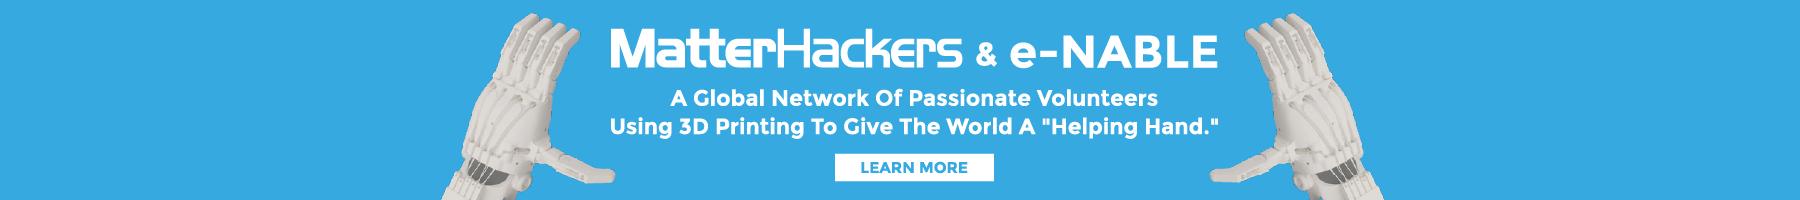 MatterHackers partners with enablingthefuture.org